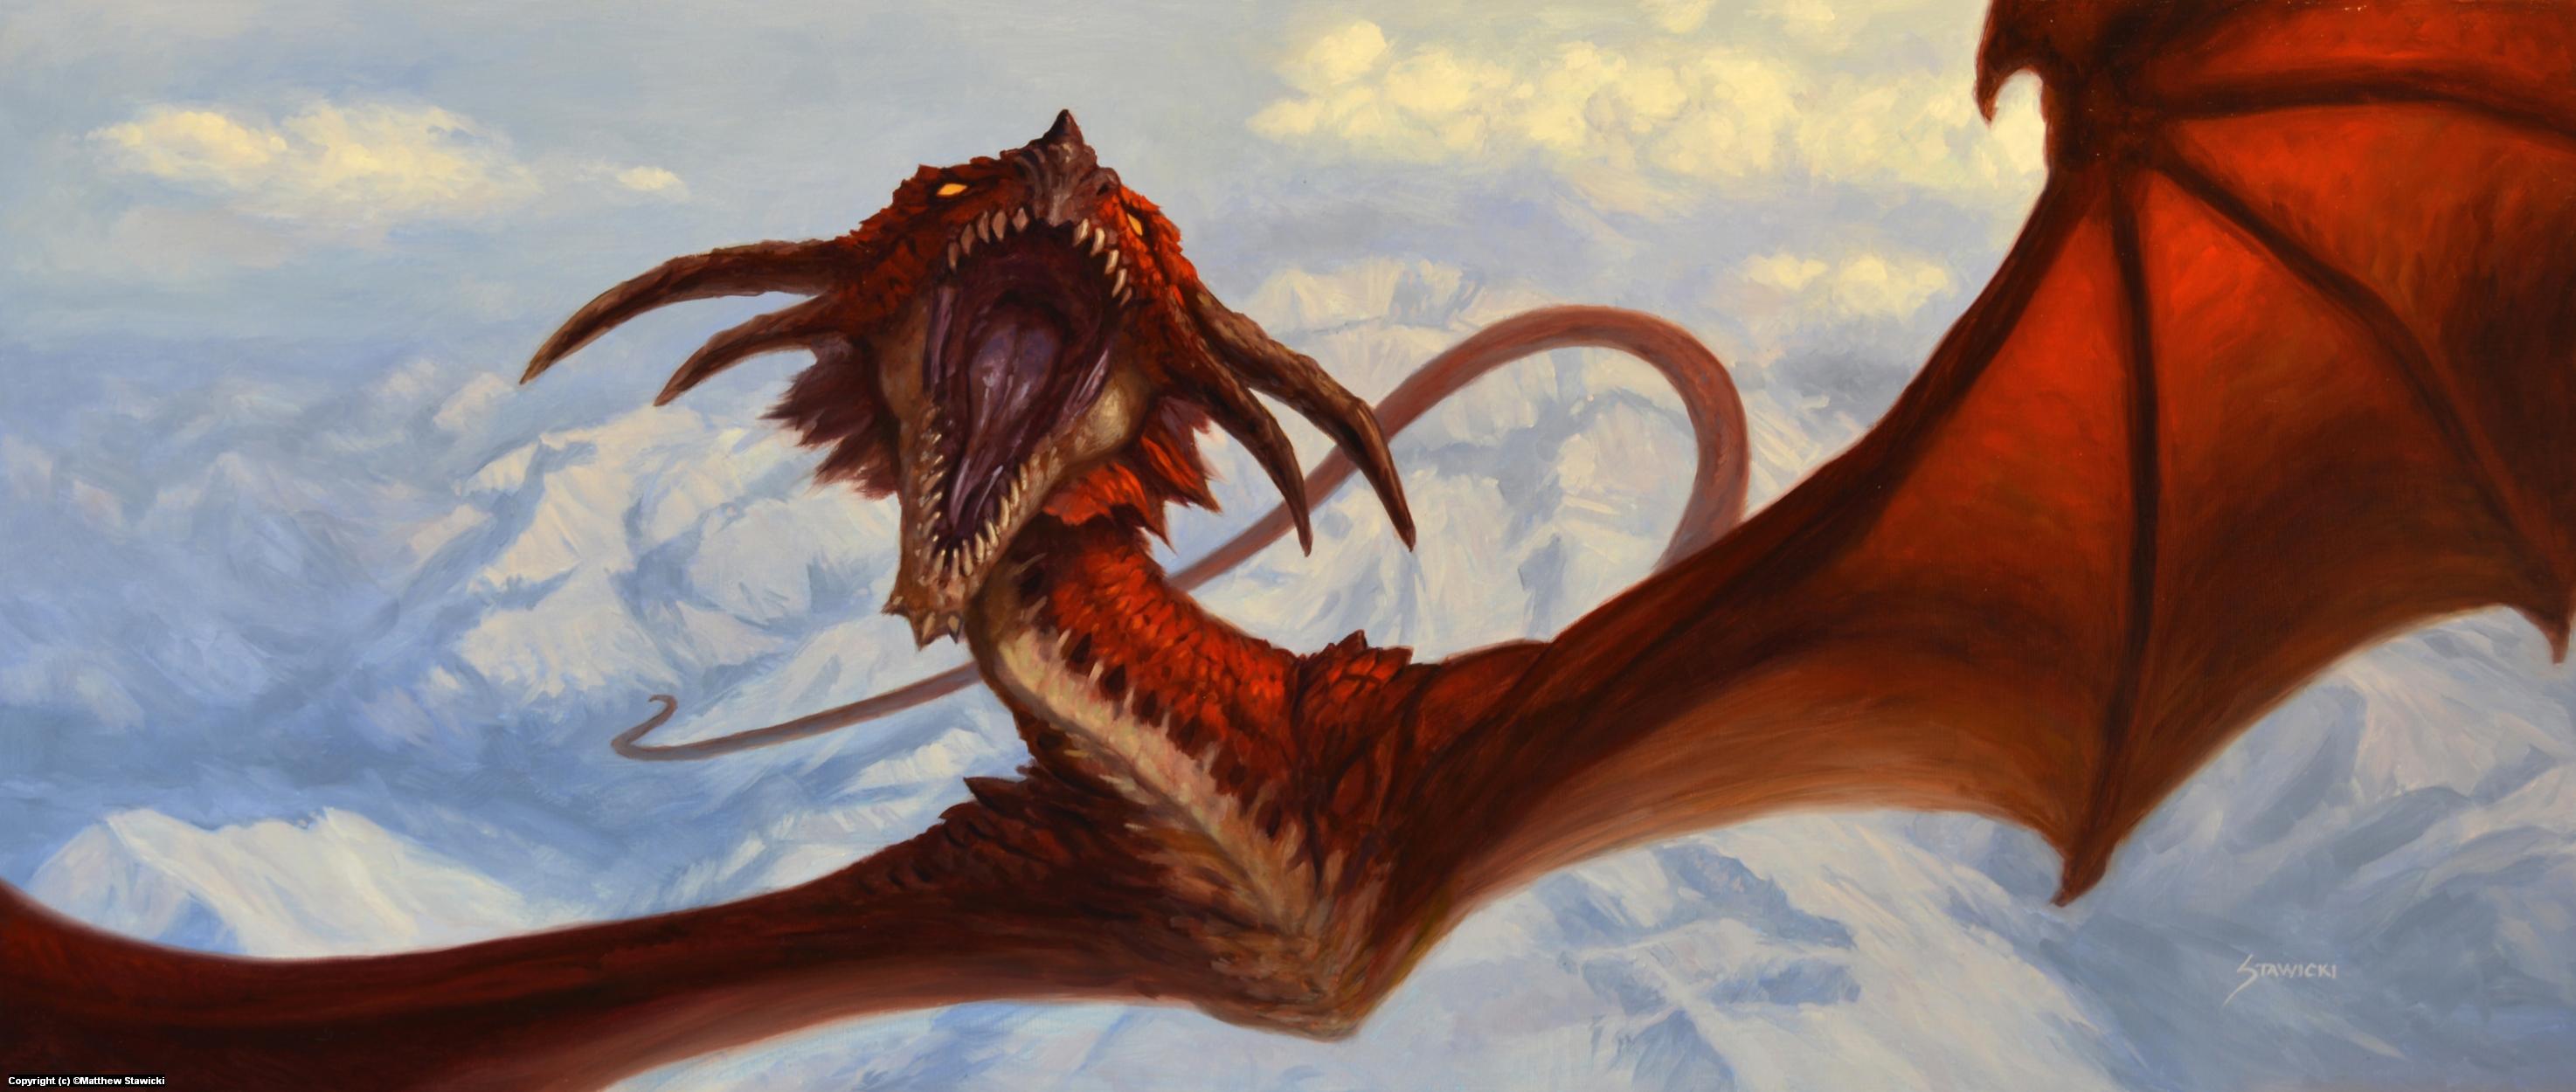 Dragon Flight Artwork by Matthew Stawicki